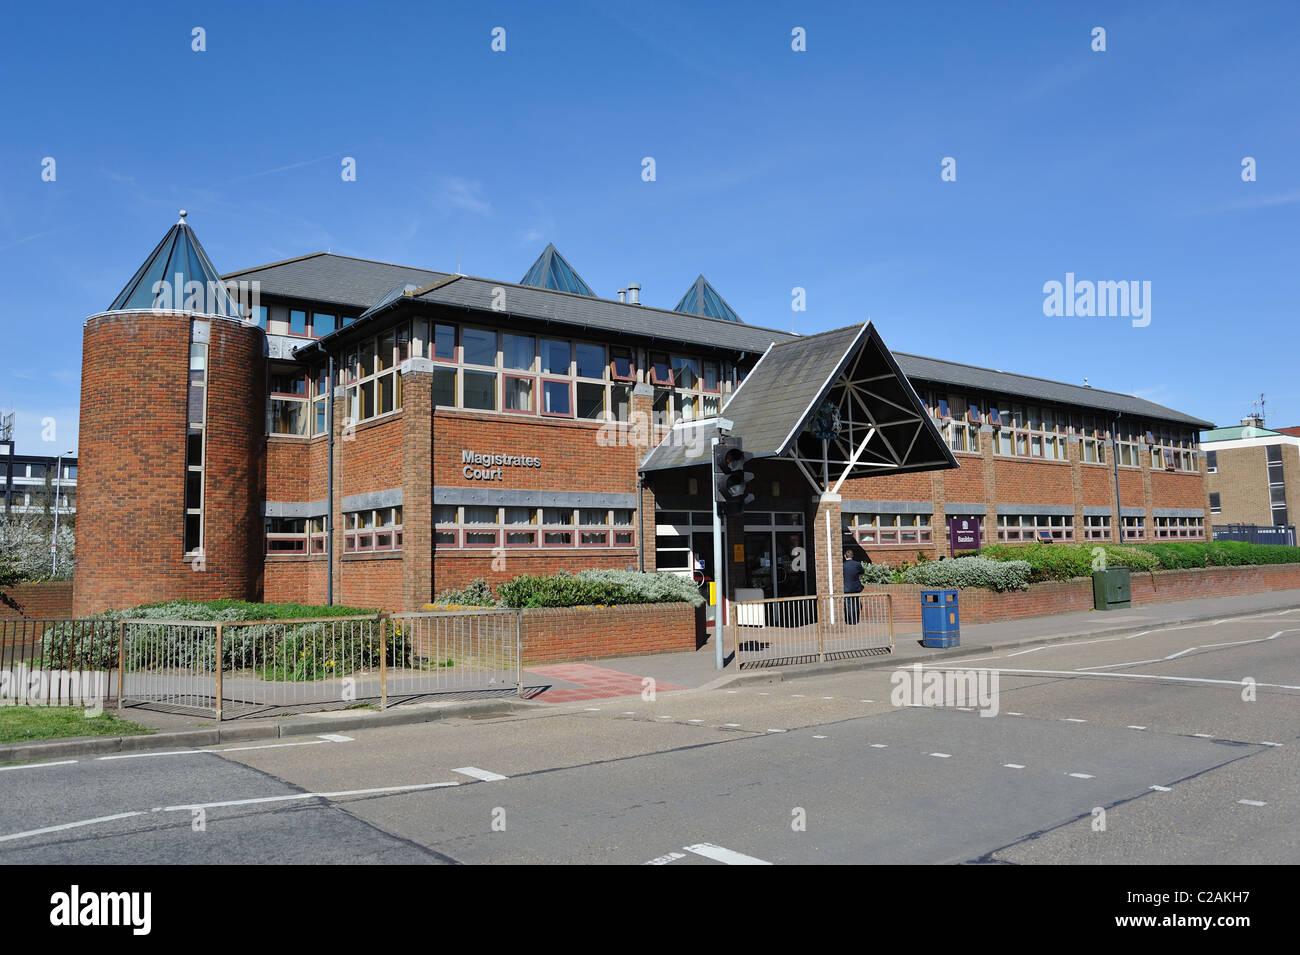 Basildon Magistrate Court House - Stock Image